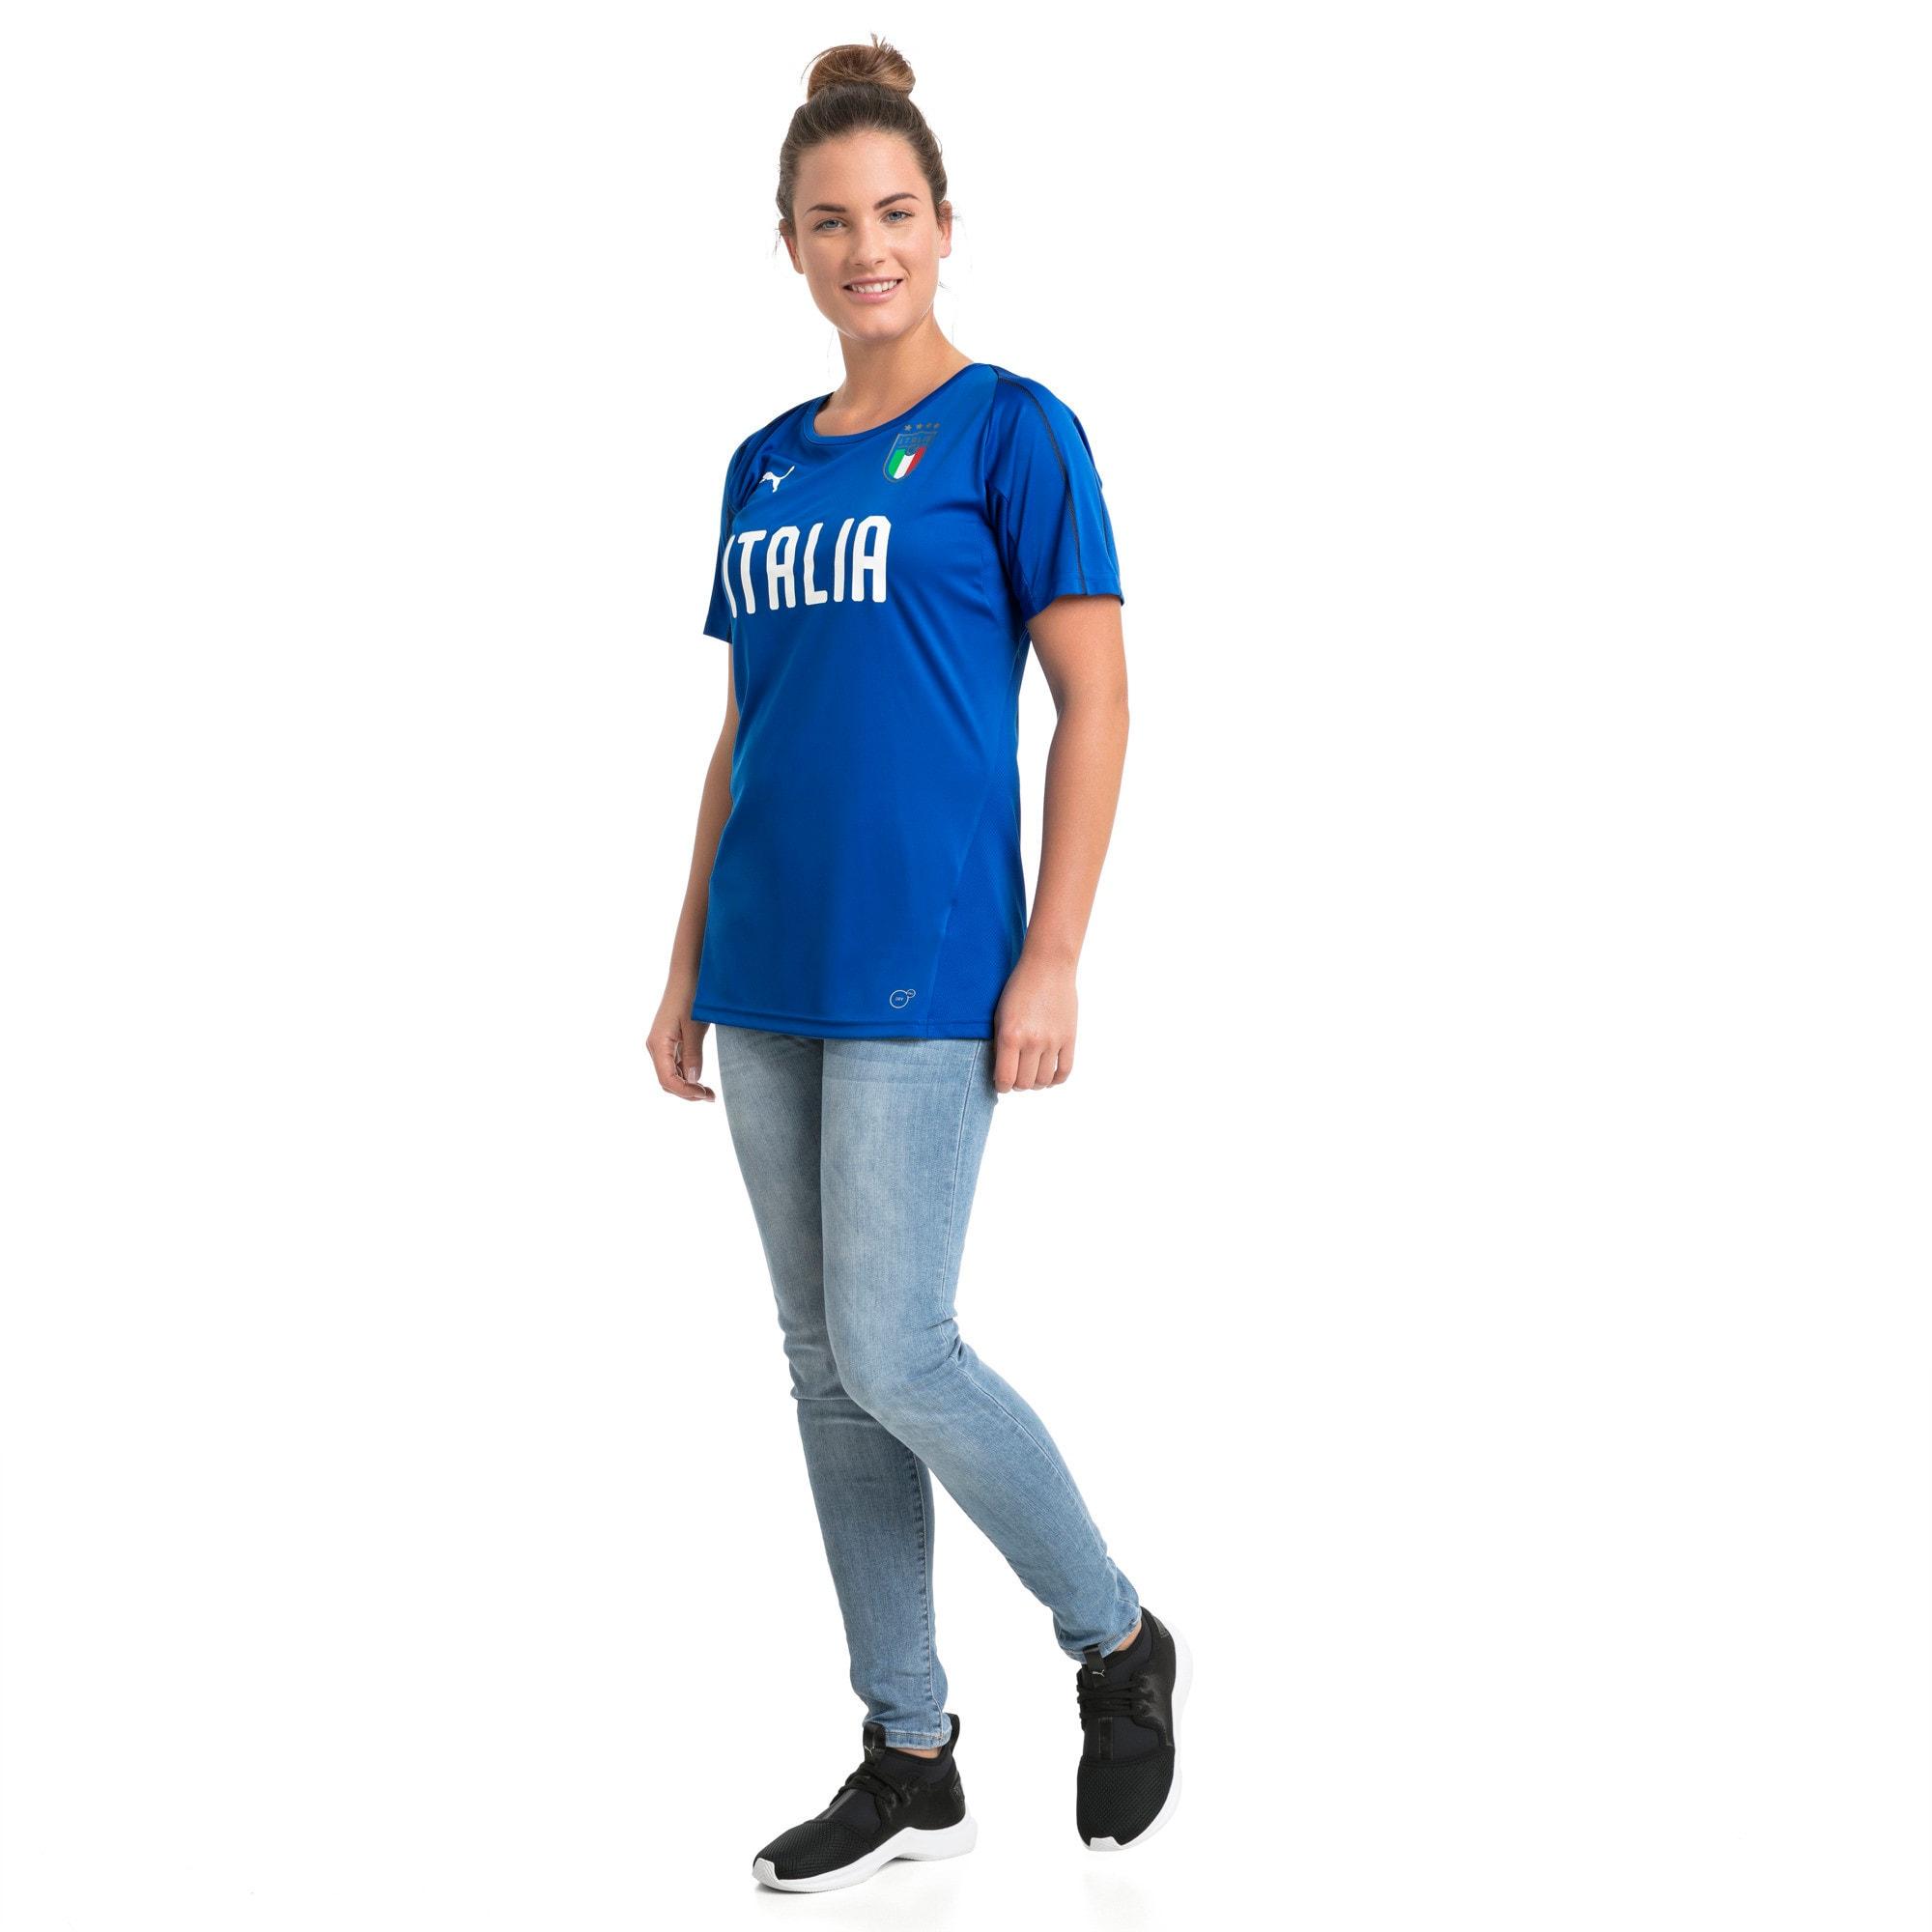 Thumbnail 5 van Italia-trainingsshirt voor vrouwen, Team Power Blue-Puma White, medium